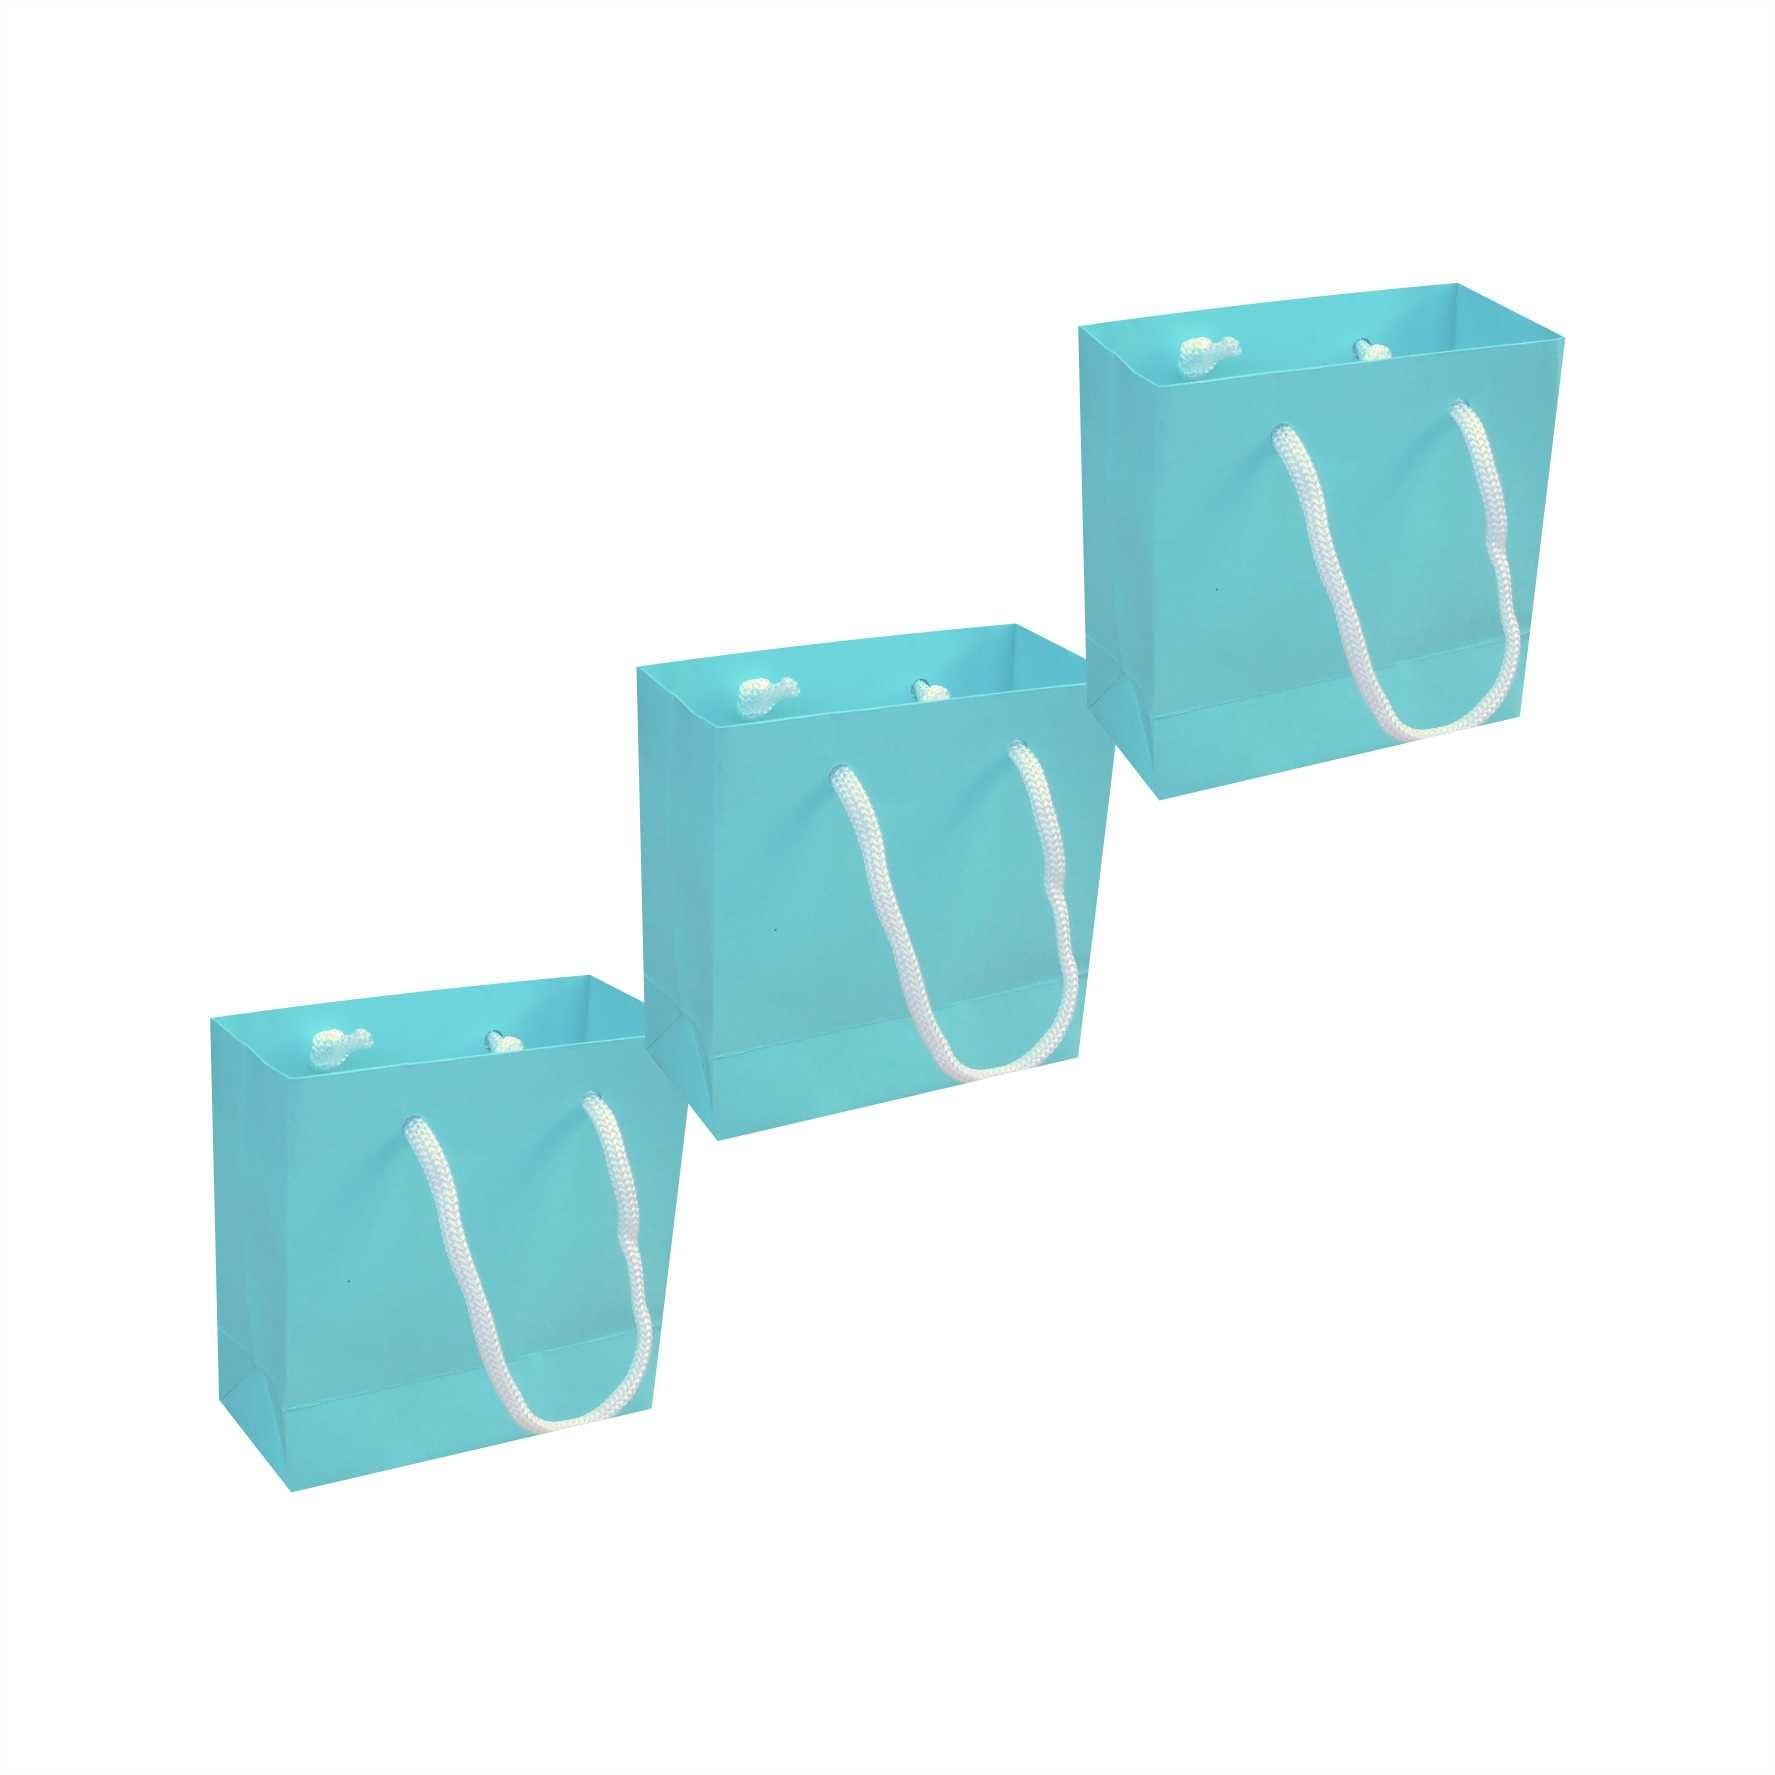 Sacola de papel mini (10x10x4,5 cm) azul tiffany - 10 unidades